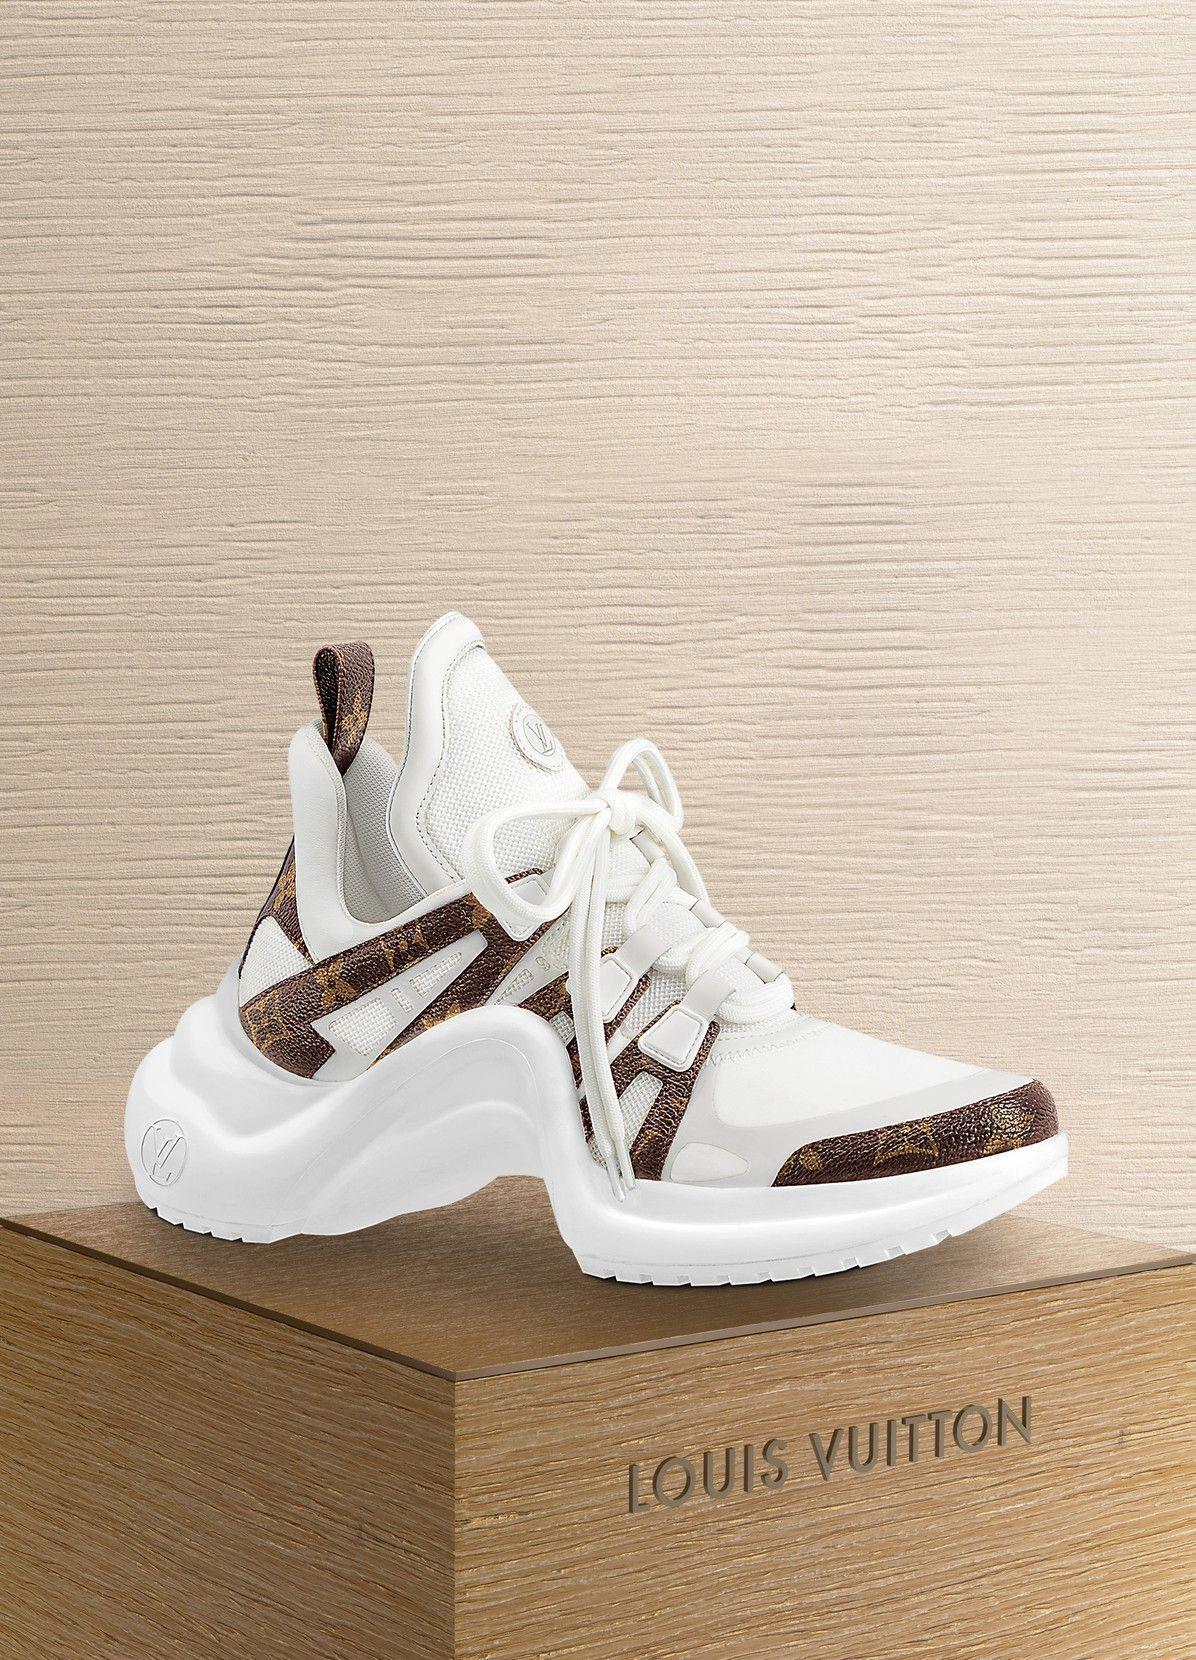 Louis Vuitton Sneaker Lv Archlight Sneakers Louis Vuitton Shoes Heels Louis Vuitton Sneaker Louis Vuitton Heels